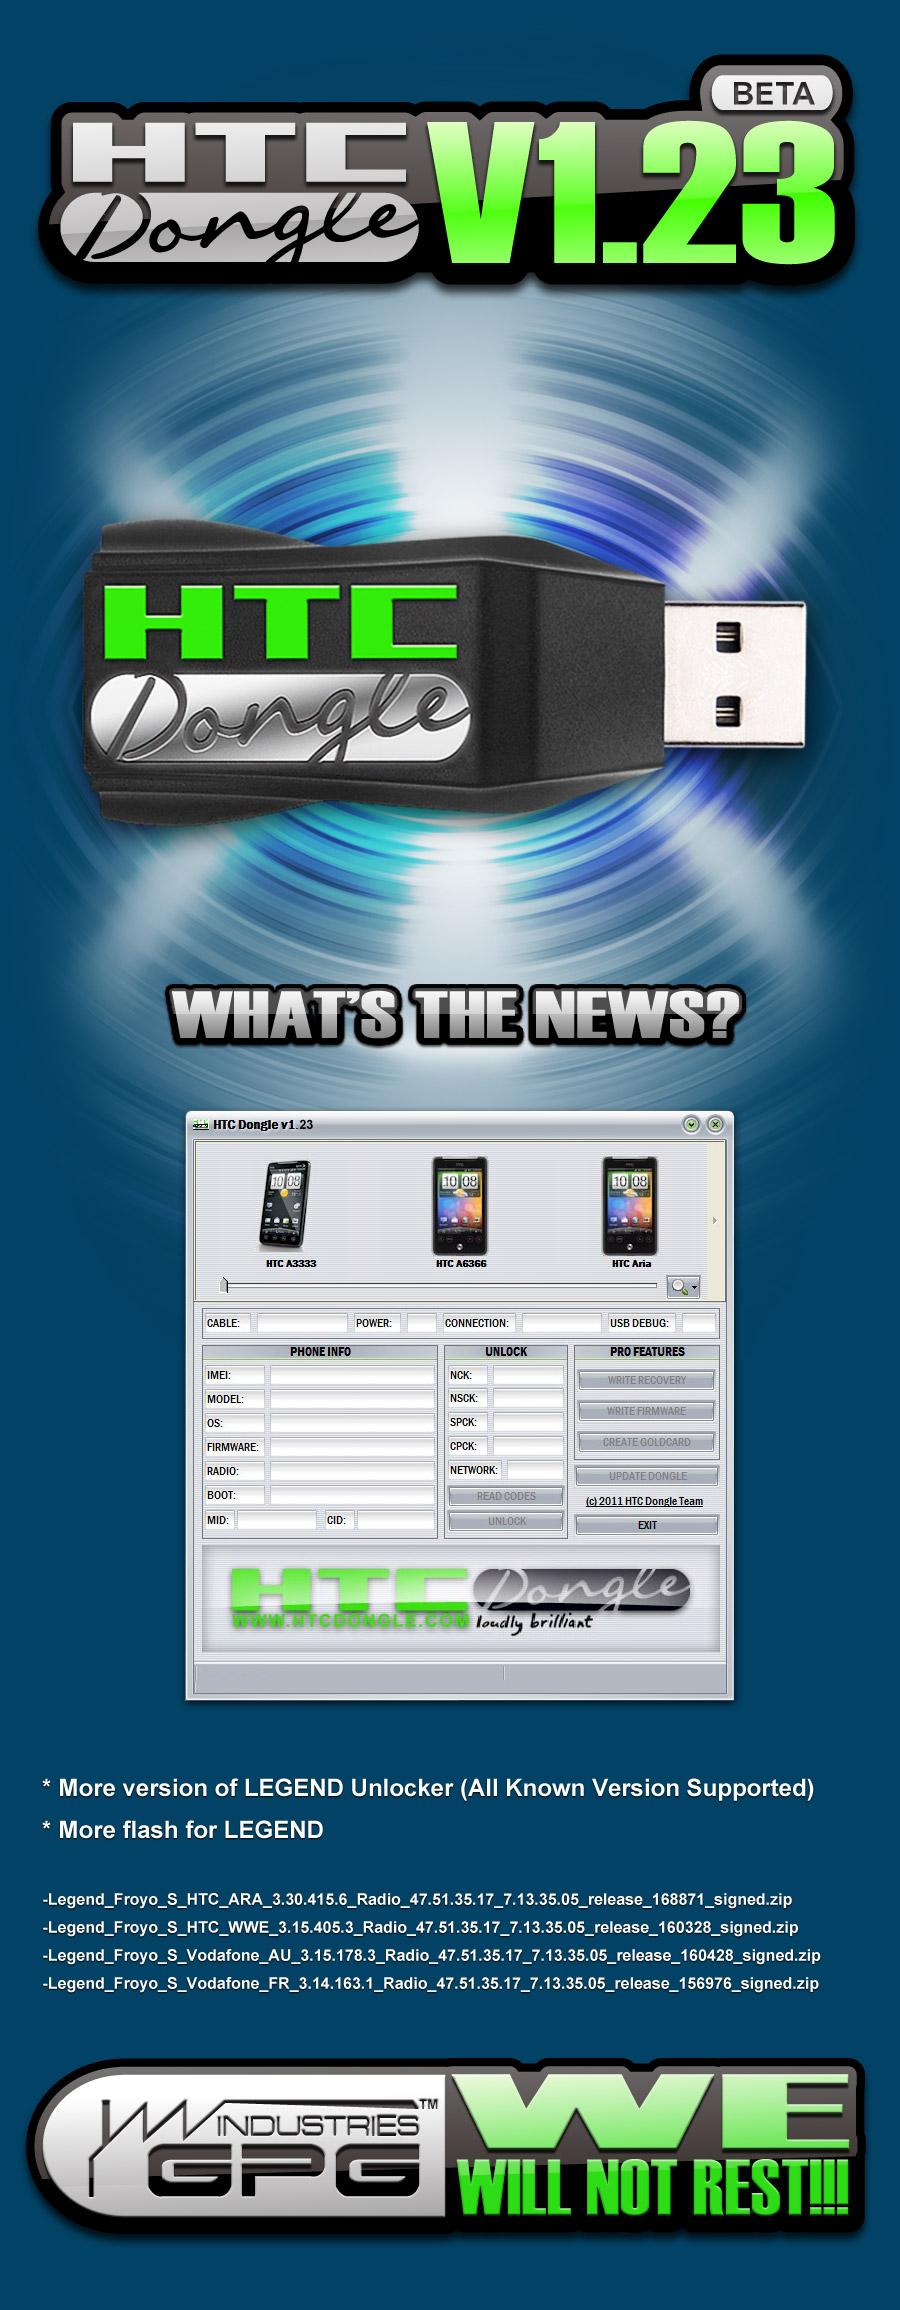 dongle 1.23 beta! More Power 2011-05-04--HTCDongle-V1.23Beta-Released.jpg